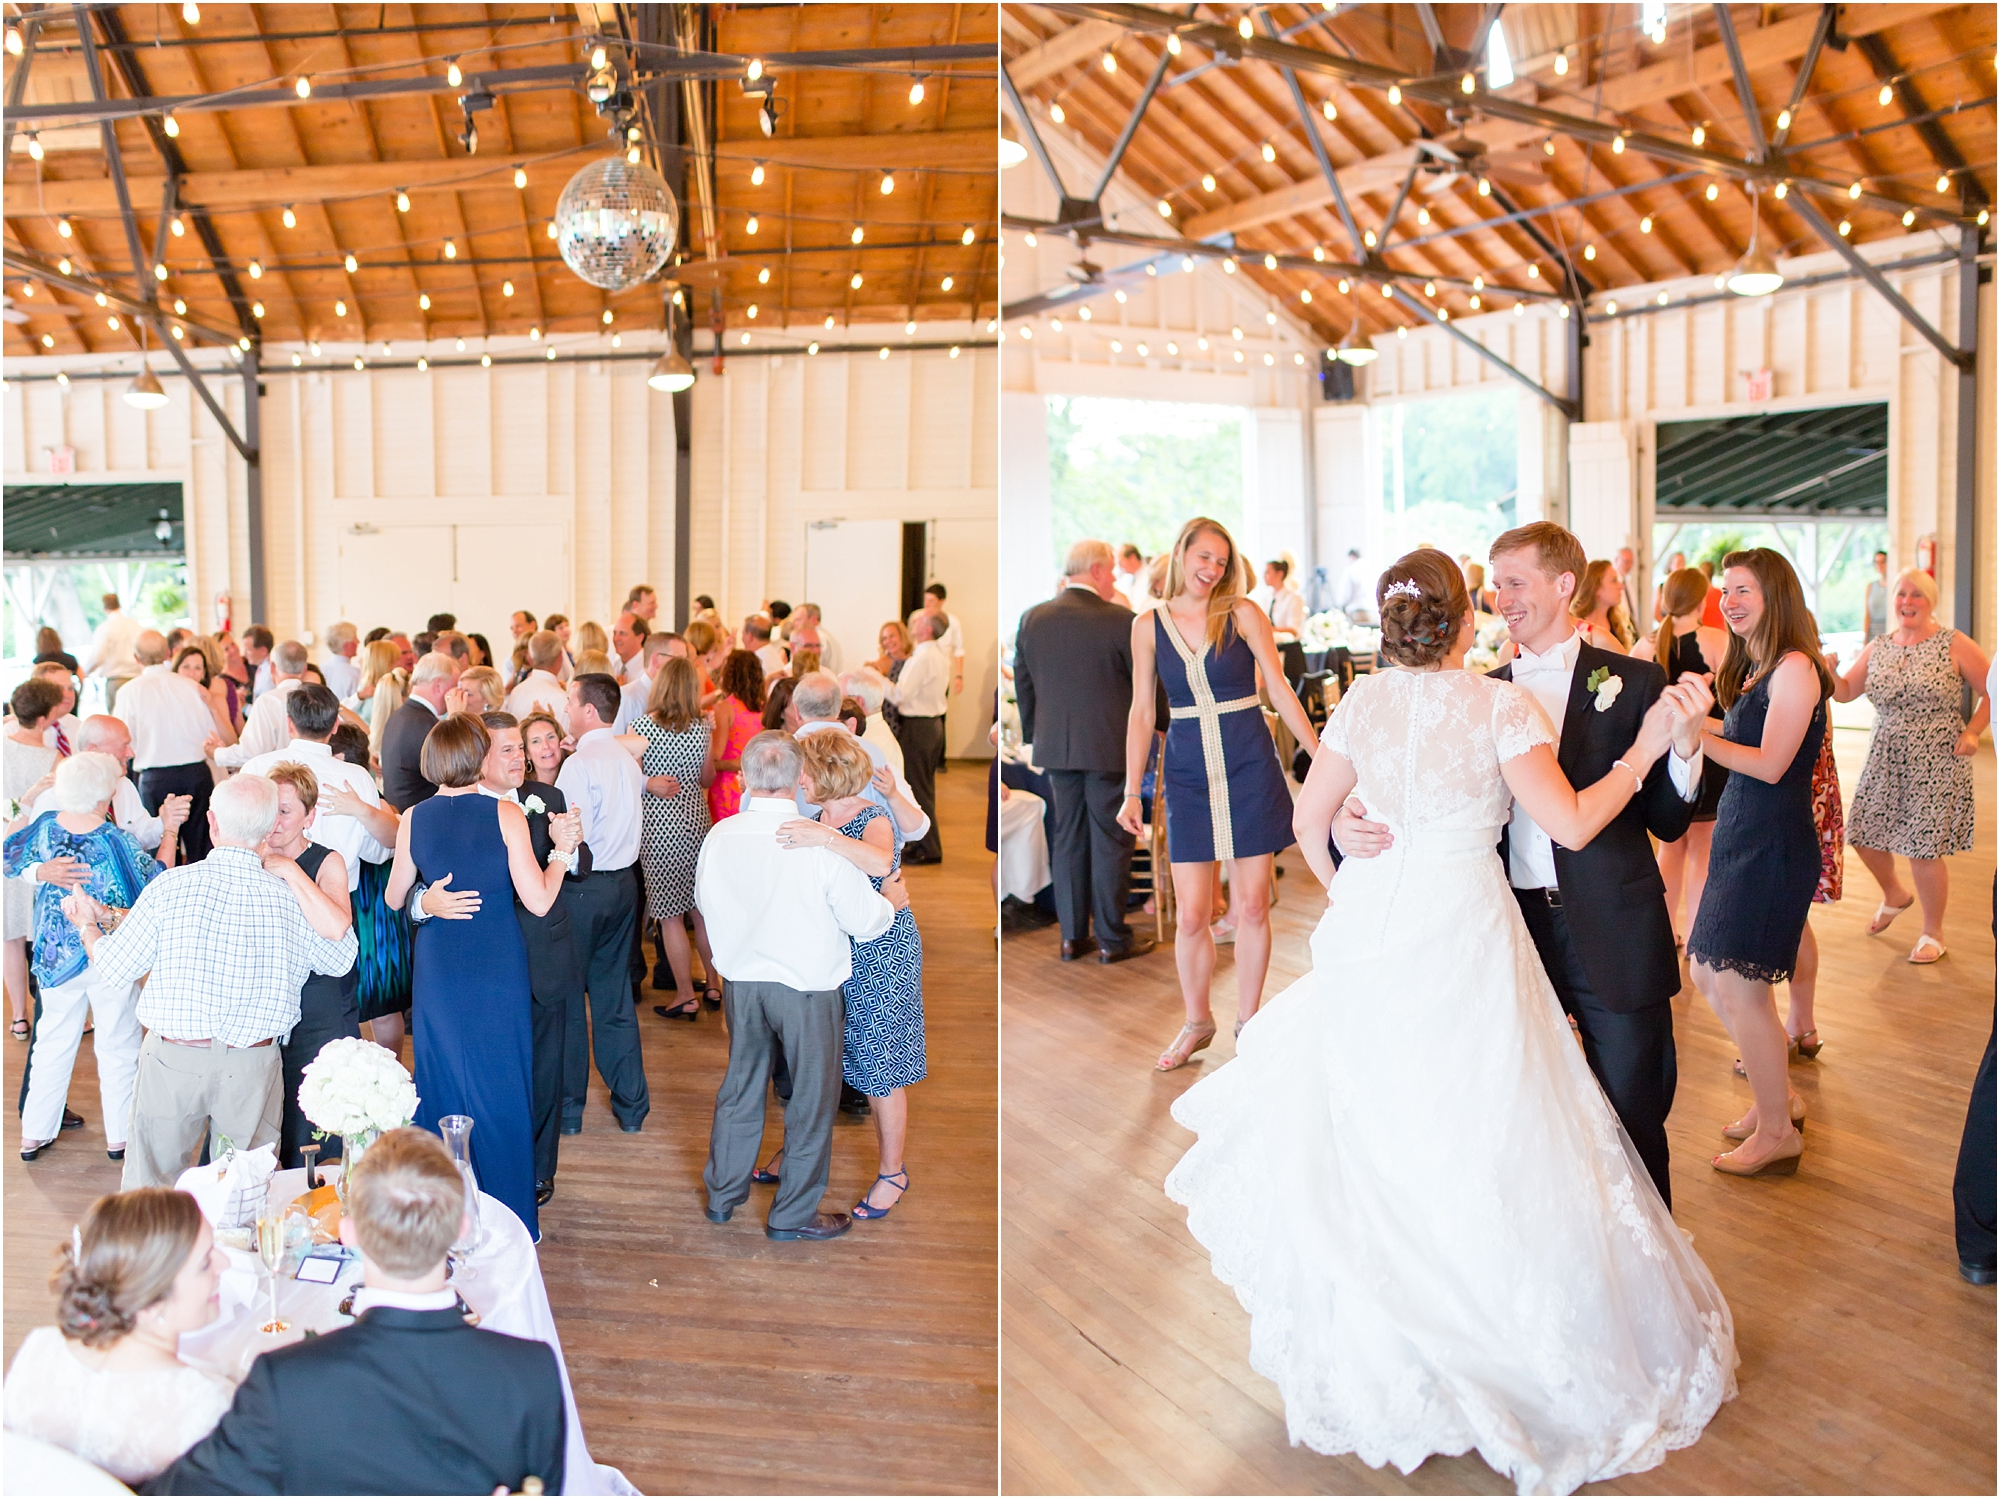 Somerville 6-Reception-472_anna grace photography sherwood forest annapolis maryland wedding photographer photo.jpg